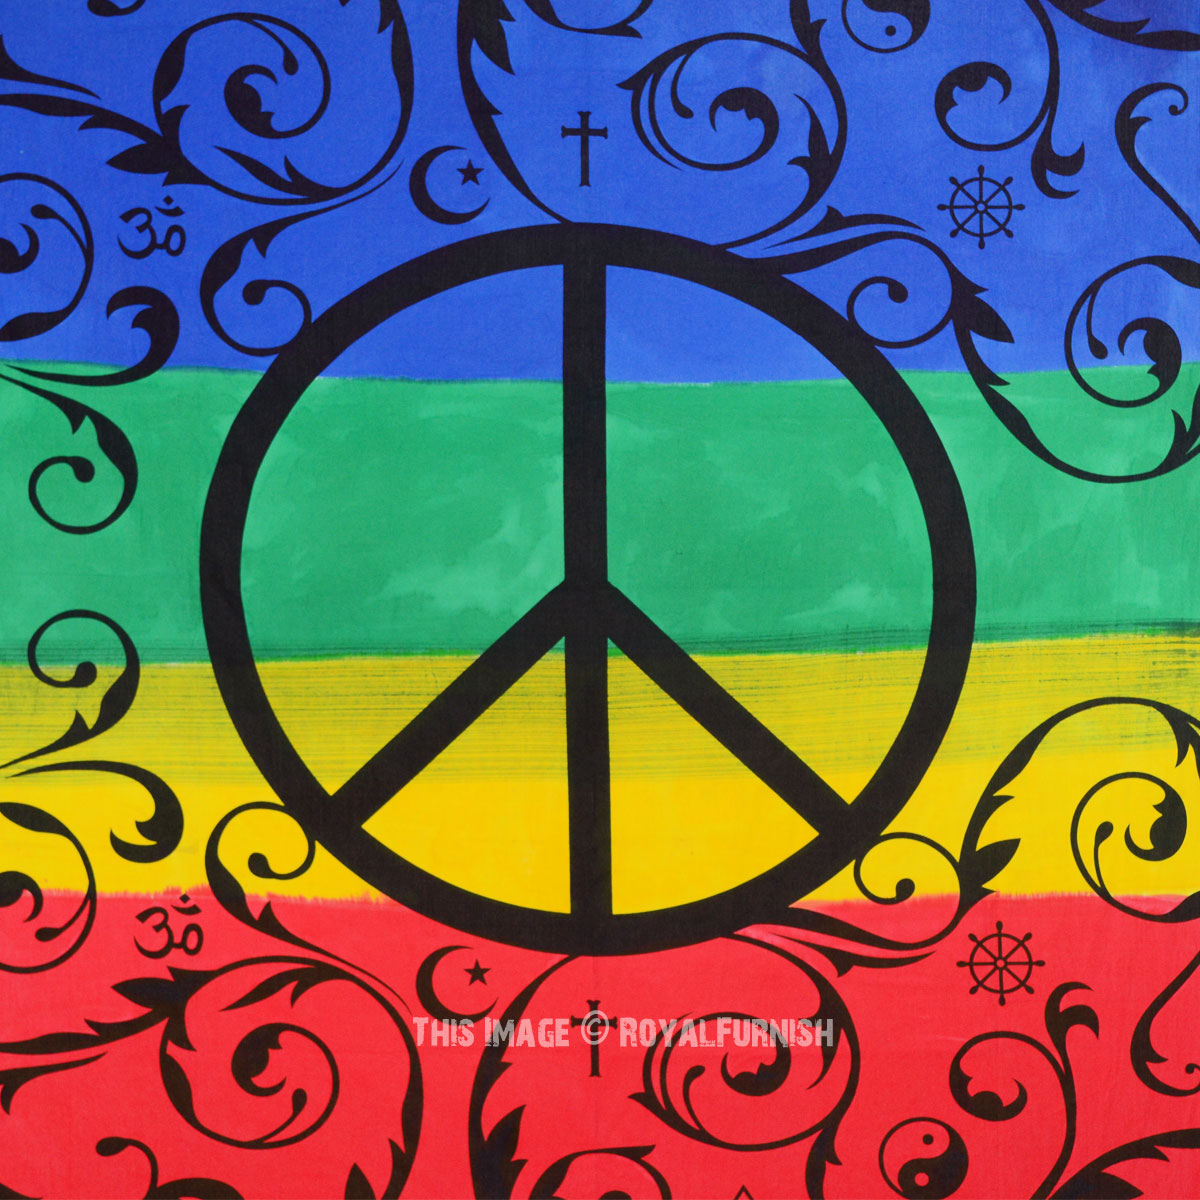 Colorful Peace Sign Symbol Tapestry Royalfurnish Com